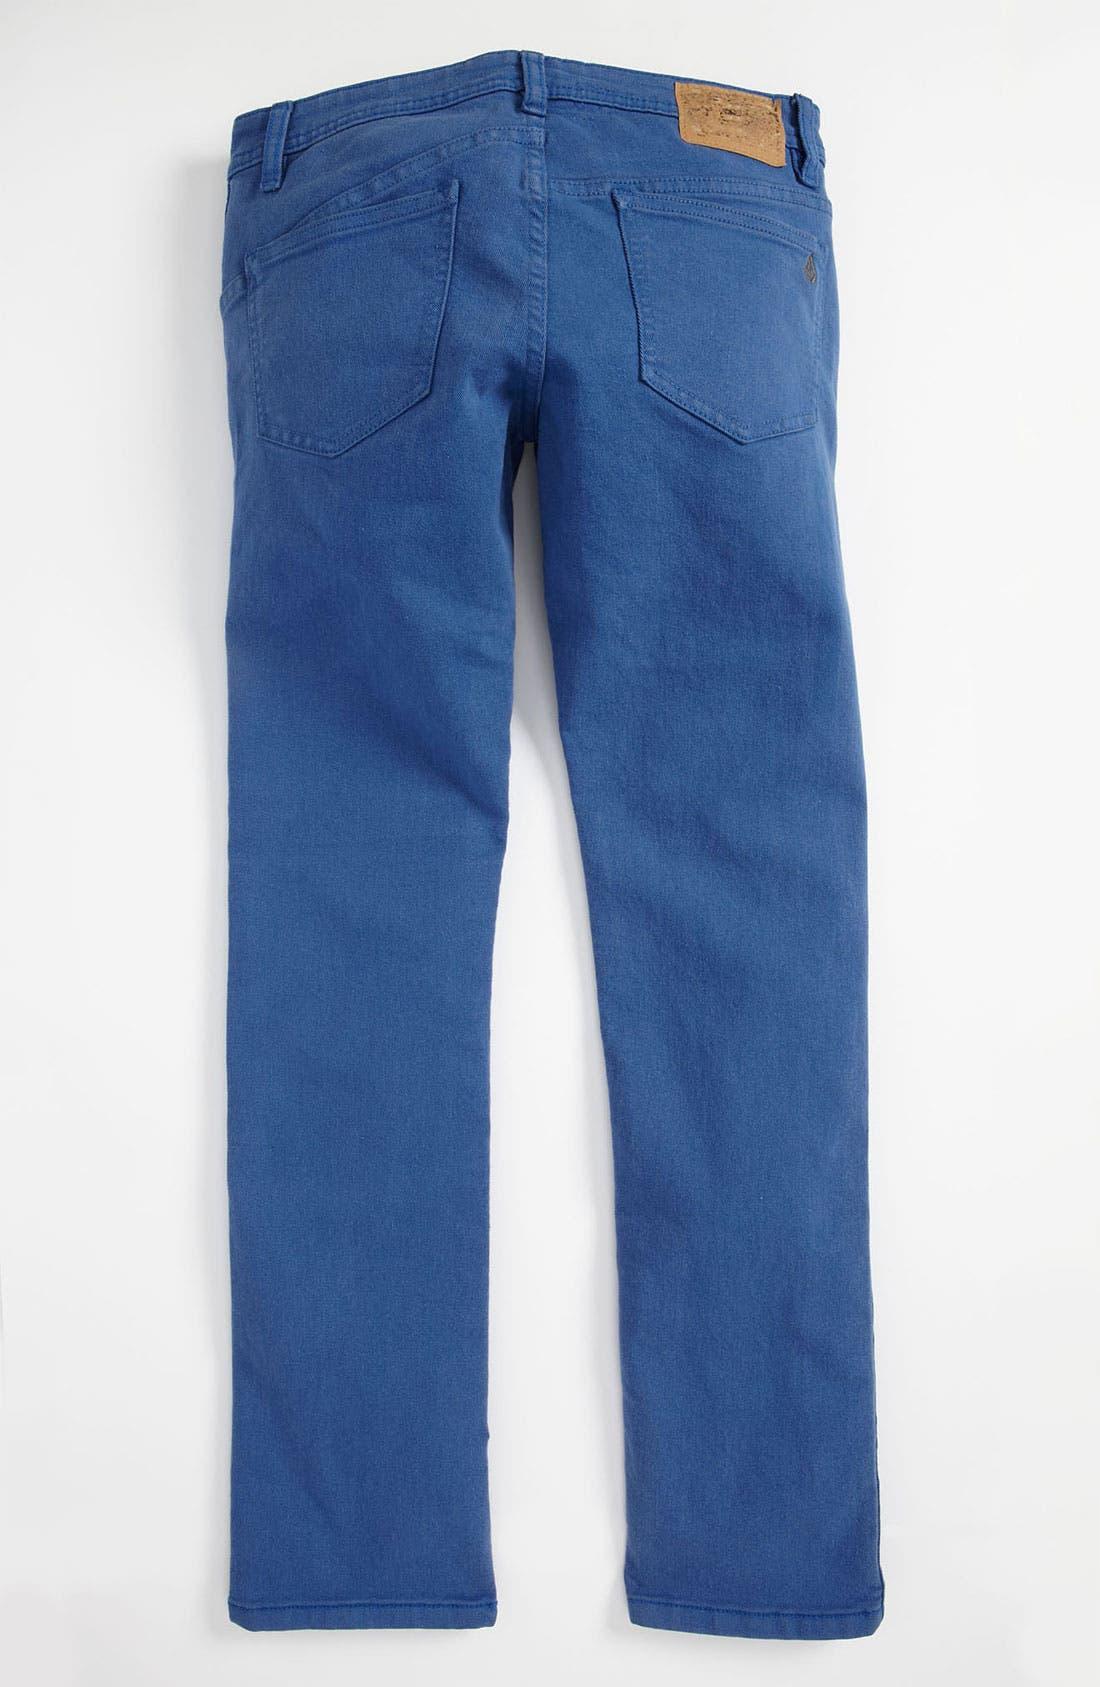 Main Image - Volcom '2 x 4' Skinny Jeans (Little Boys)